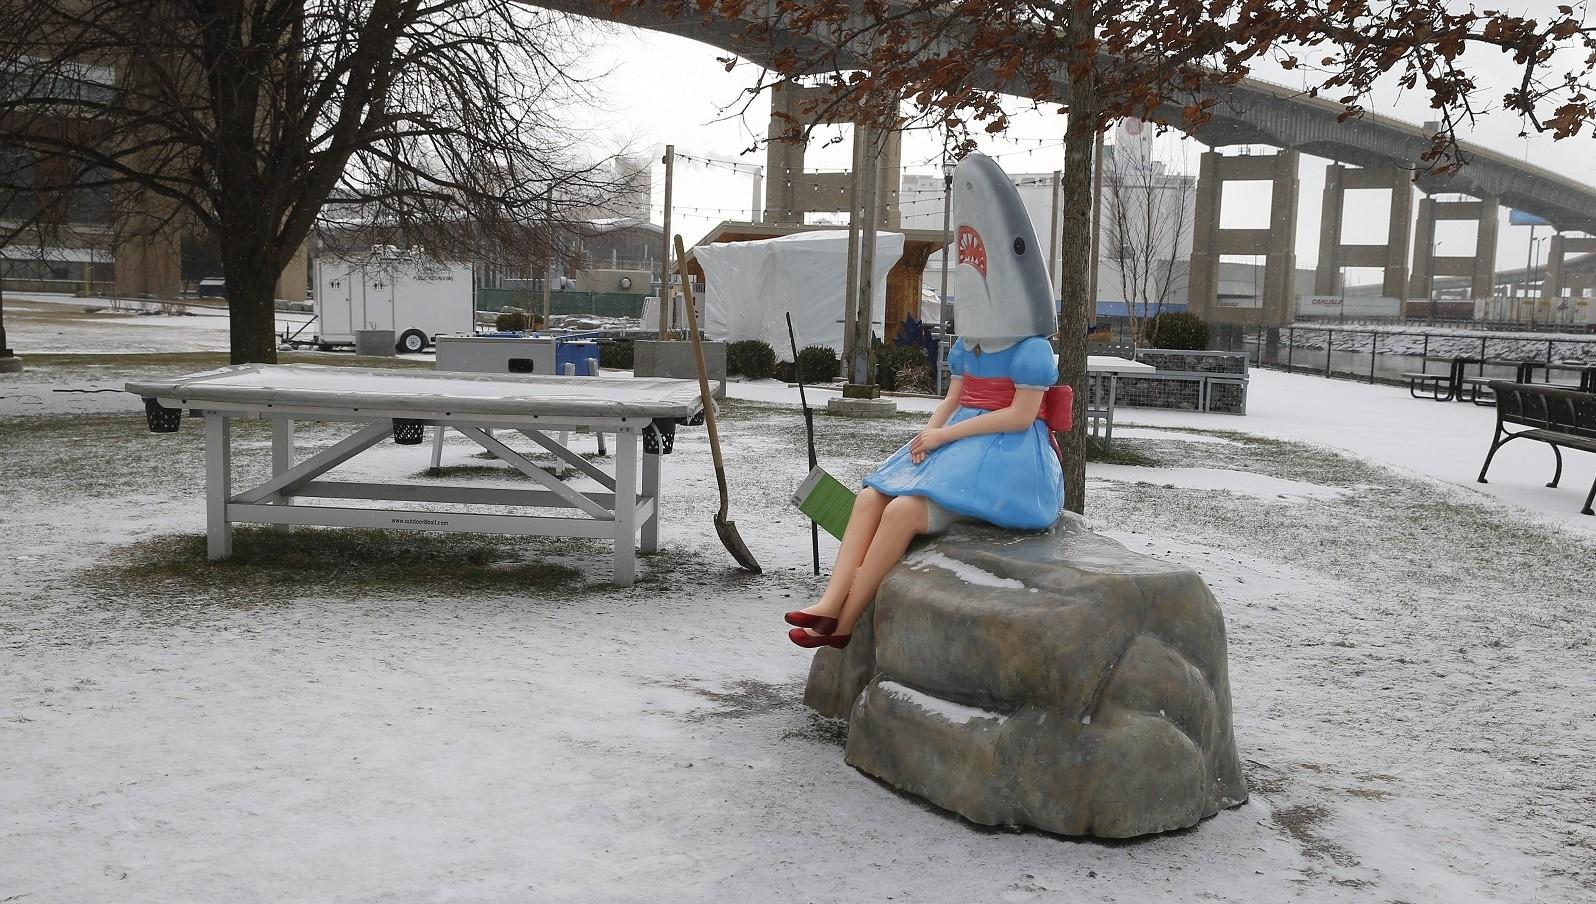 Obligatory Shark Girl shot. (John Hickey/Buffalo News file photo)